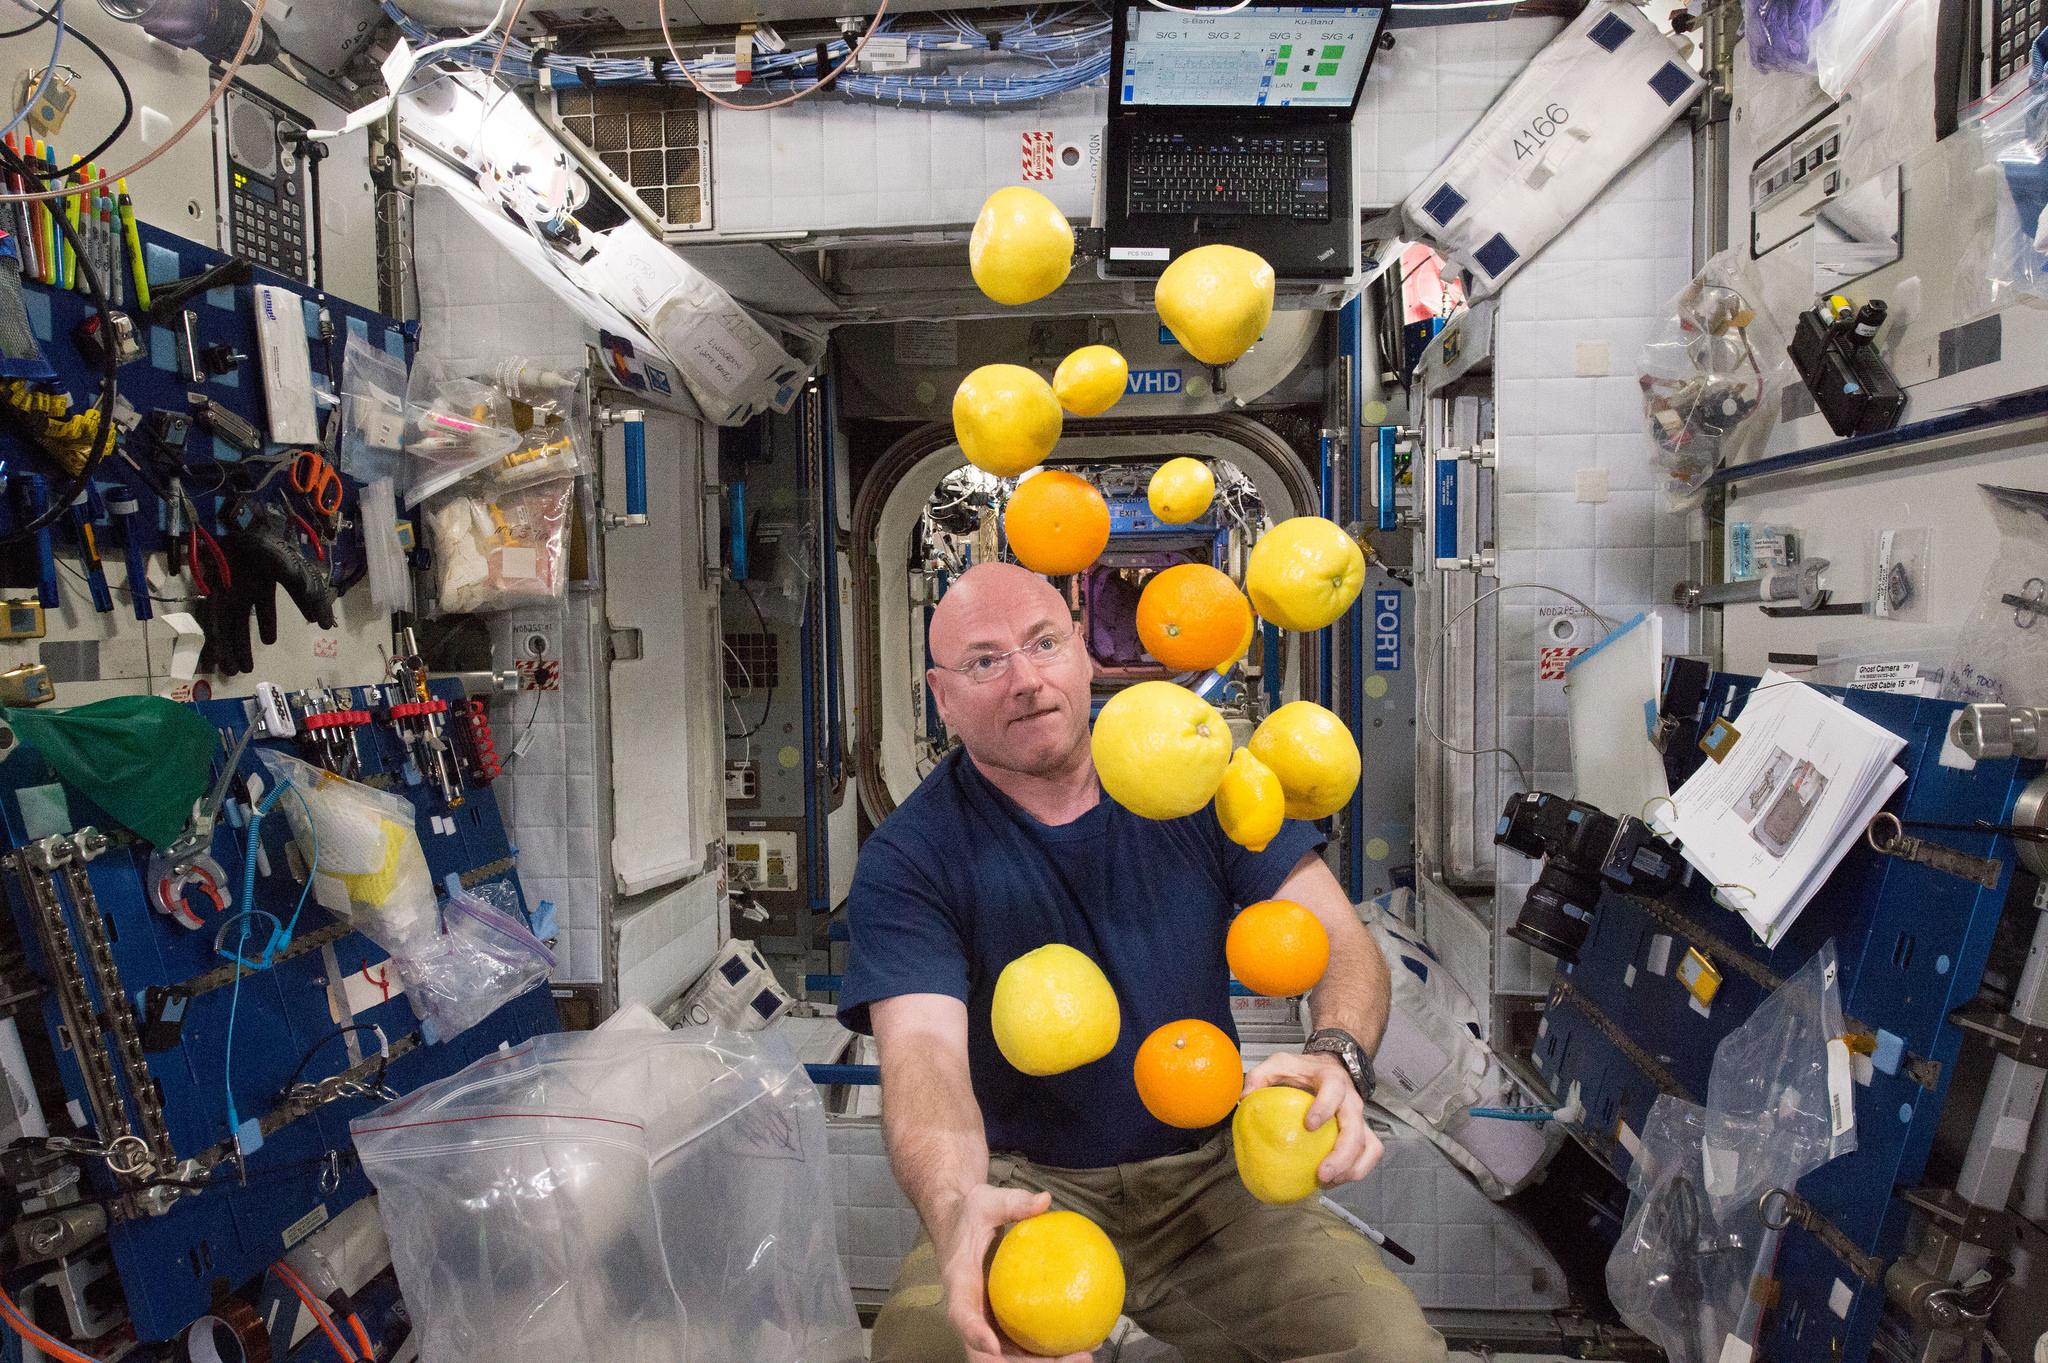 Astronaut Scott Kelly Corrals Fresh Fruit